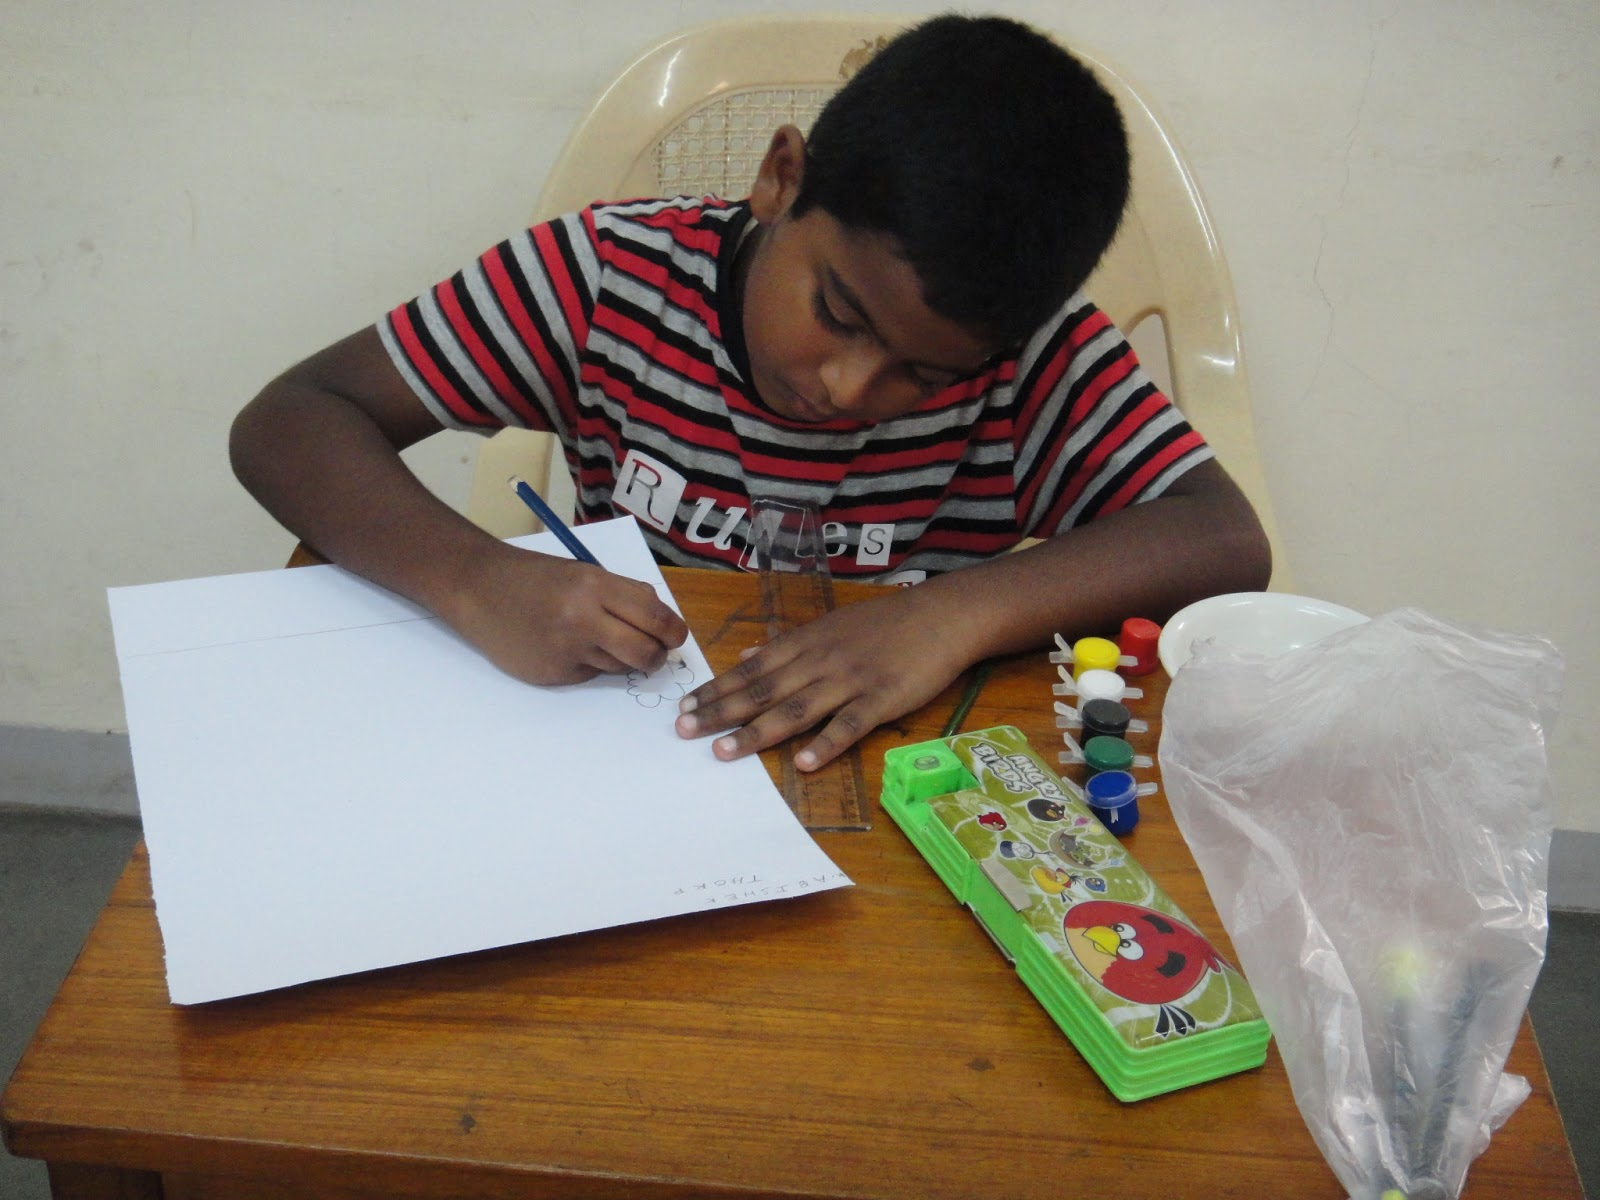 Criteria for judging a skill b creativity interpretation of theme c pencil control d shading outline